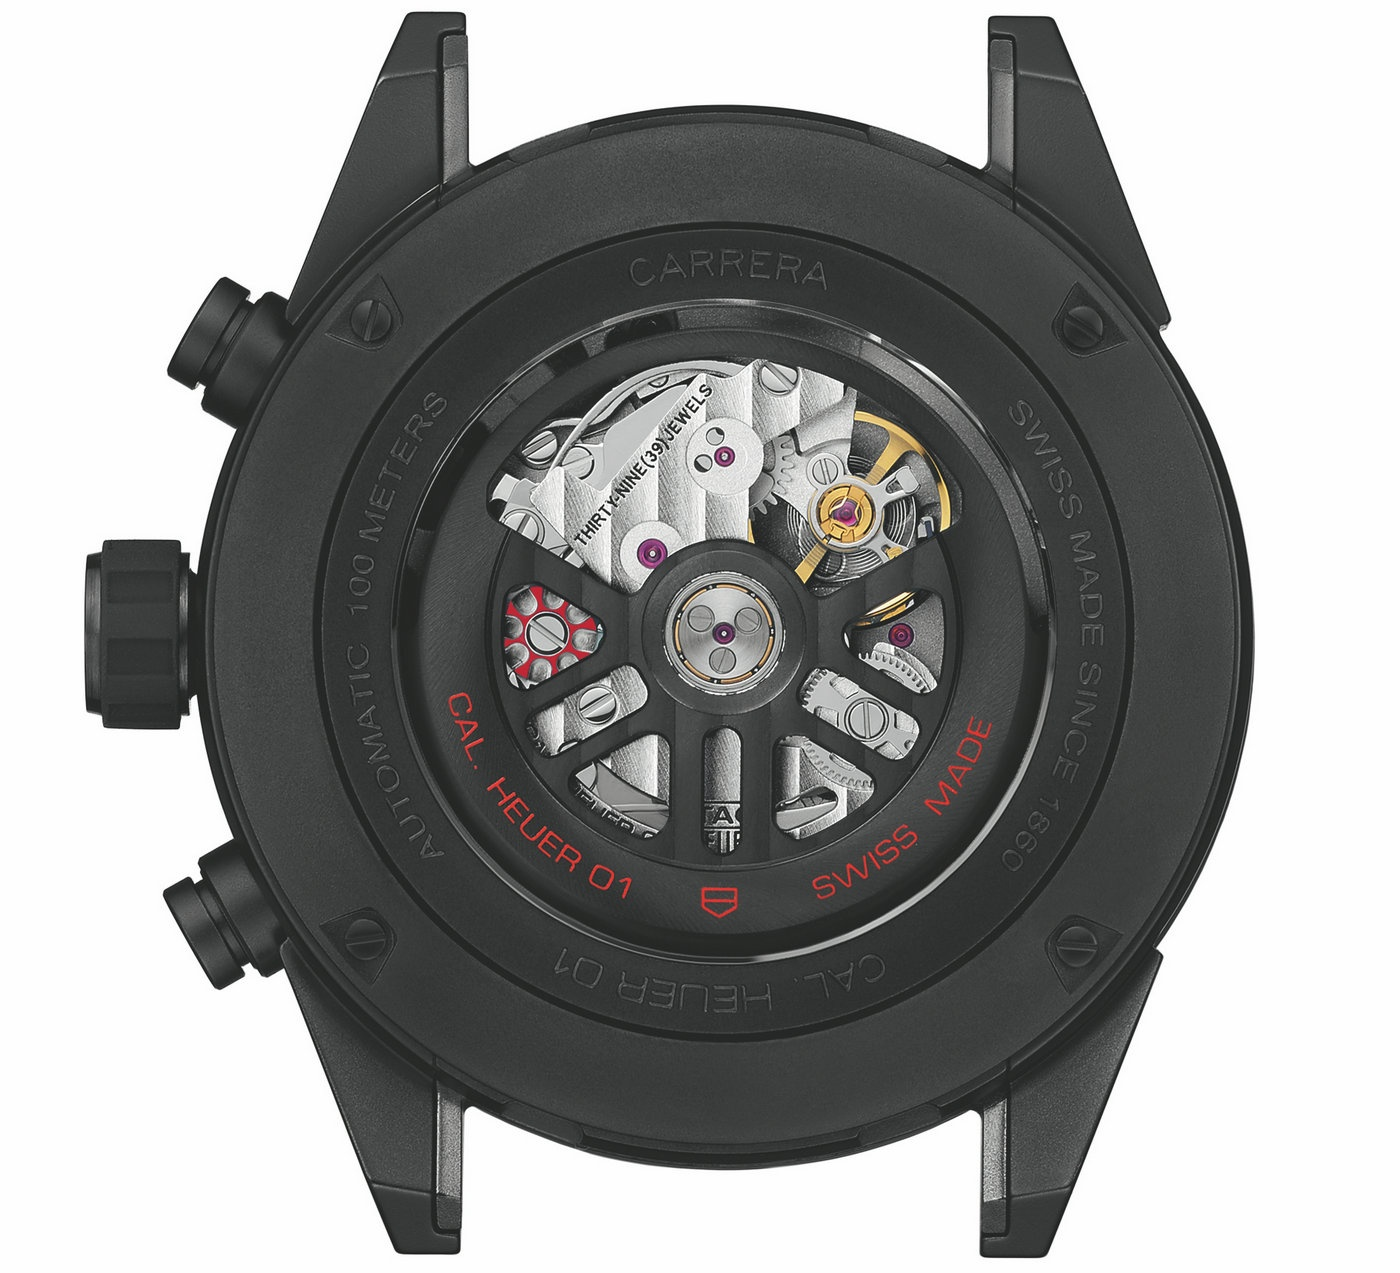 TAG Heuer 泰格豪雅Carrera卡莱拉系列 HEUER-01 腕表 全黑亚光陶瓷款